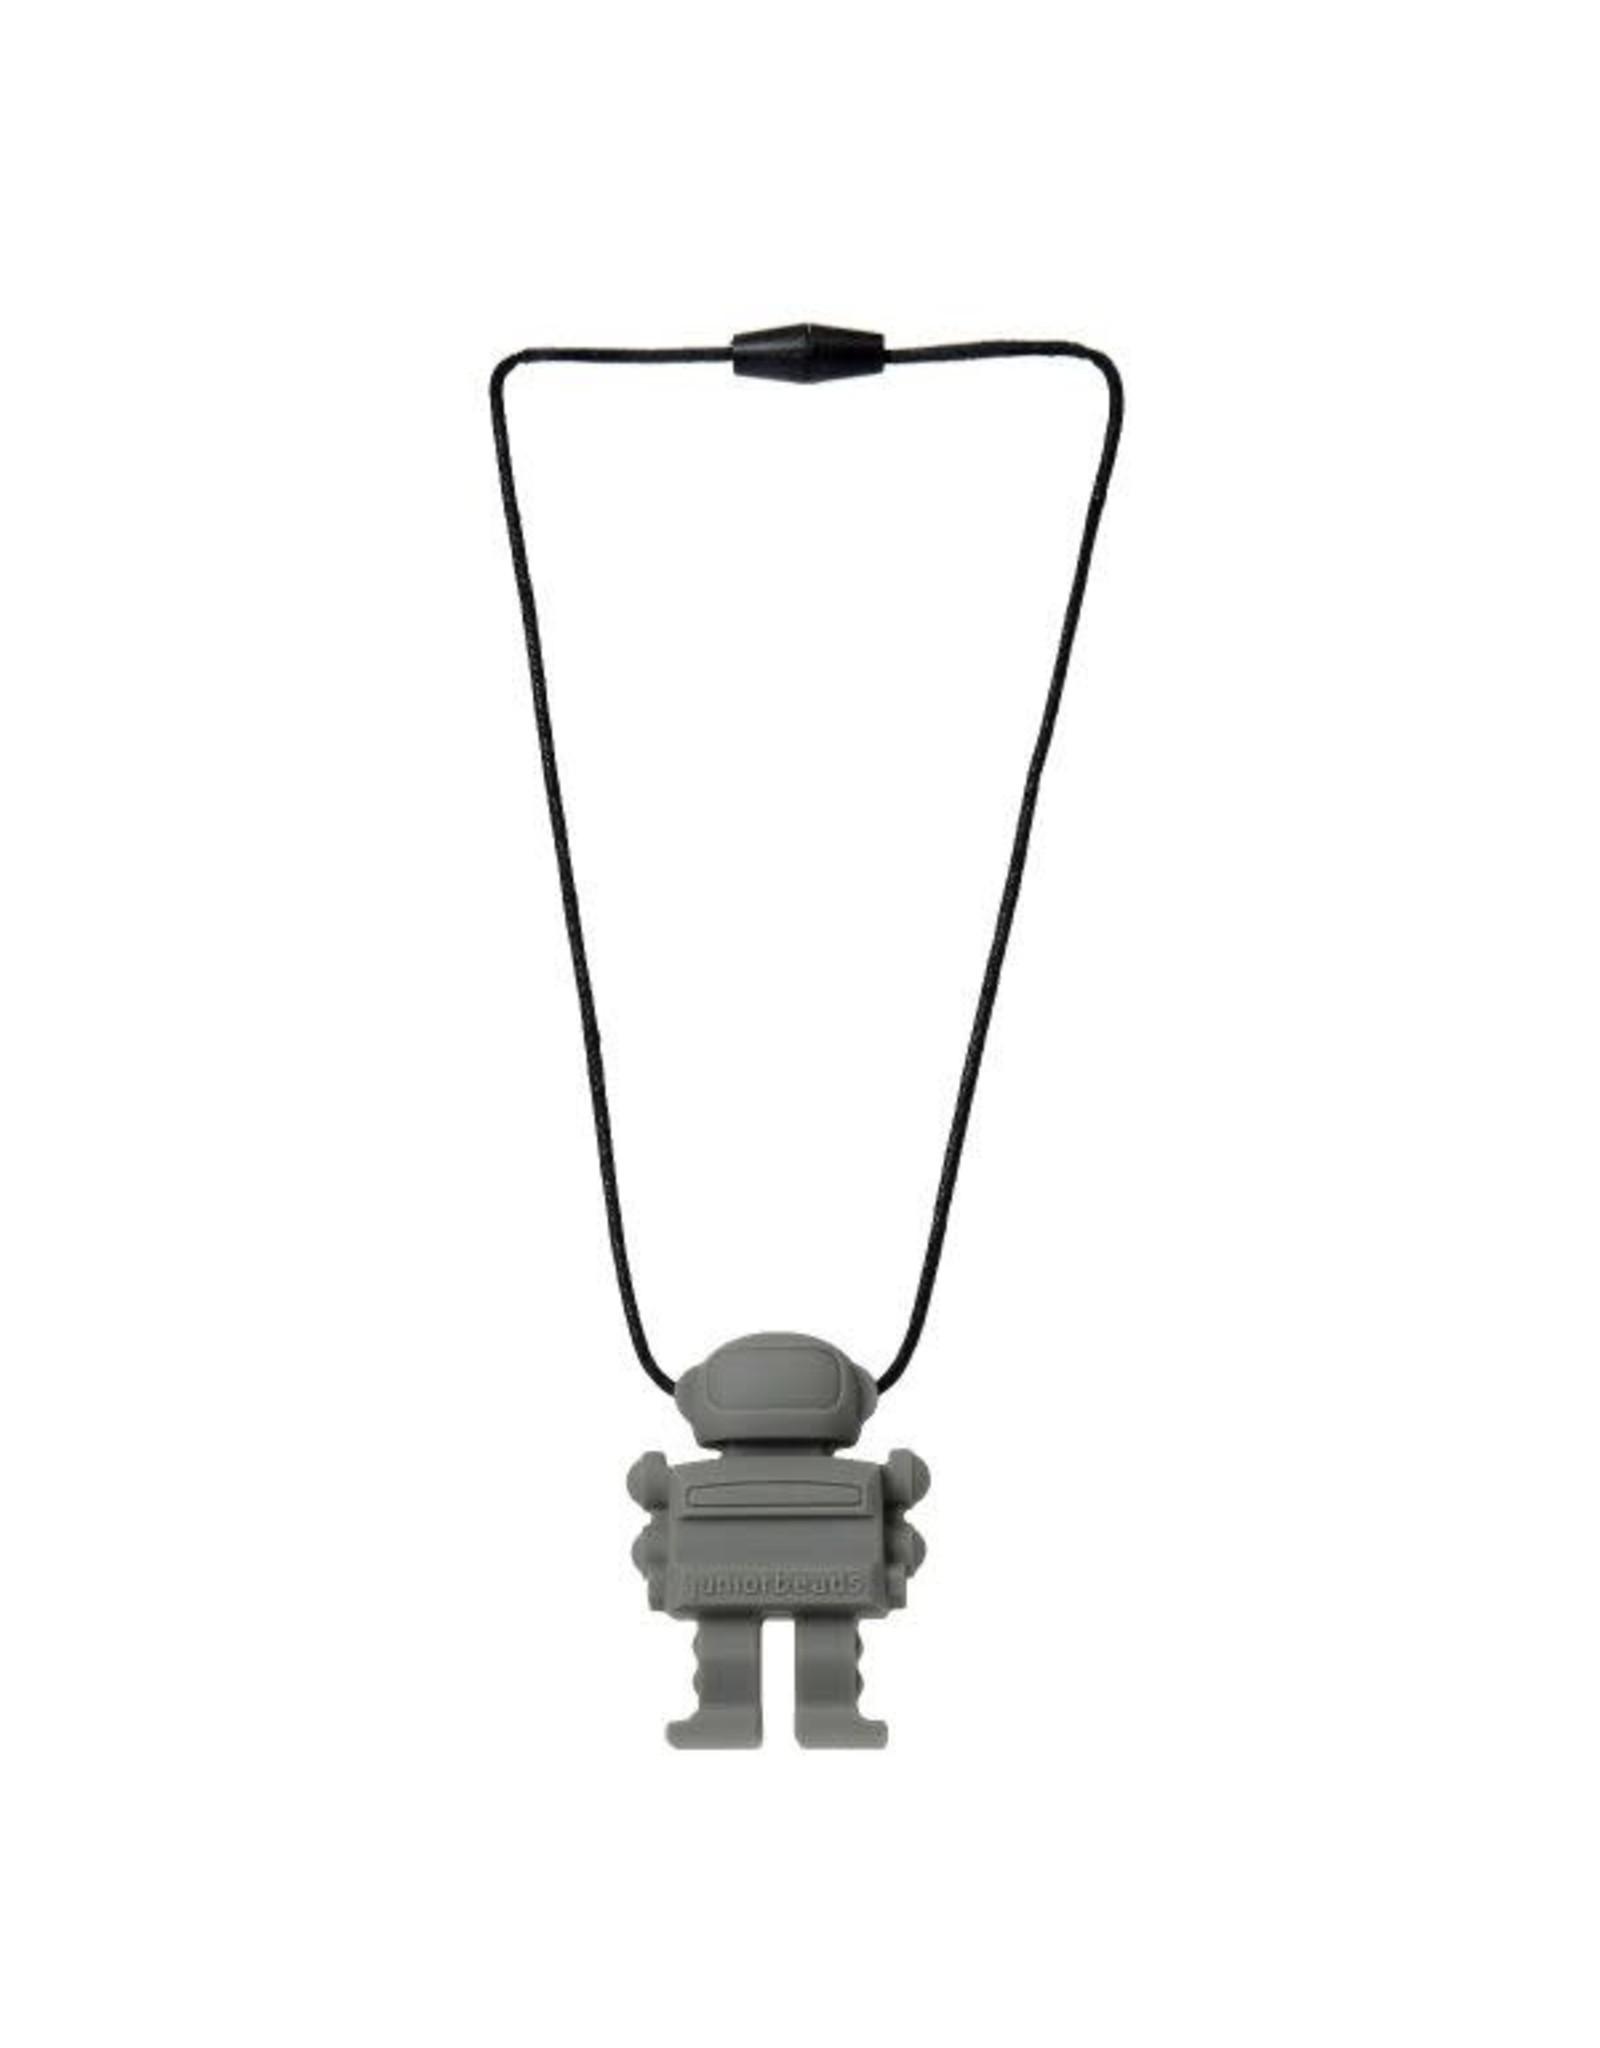 Chewbeads Chewbeads Spaceman Pendant (stormy grey)